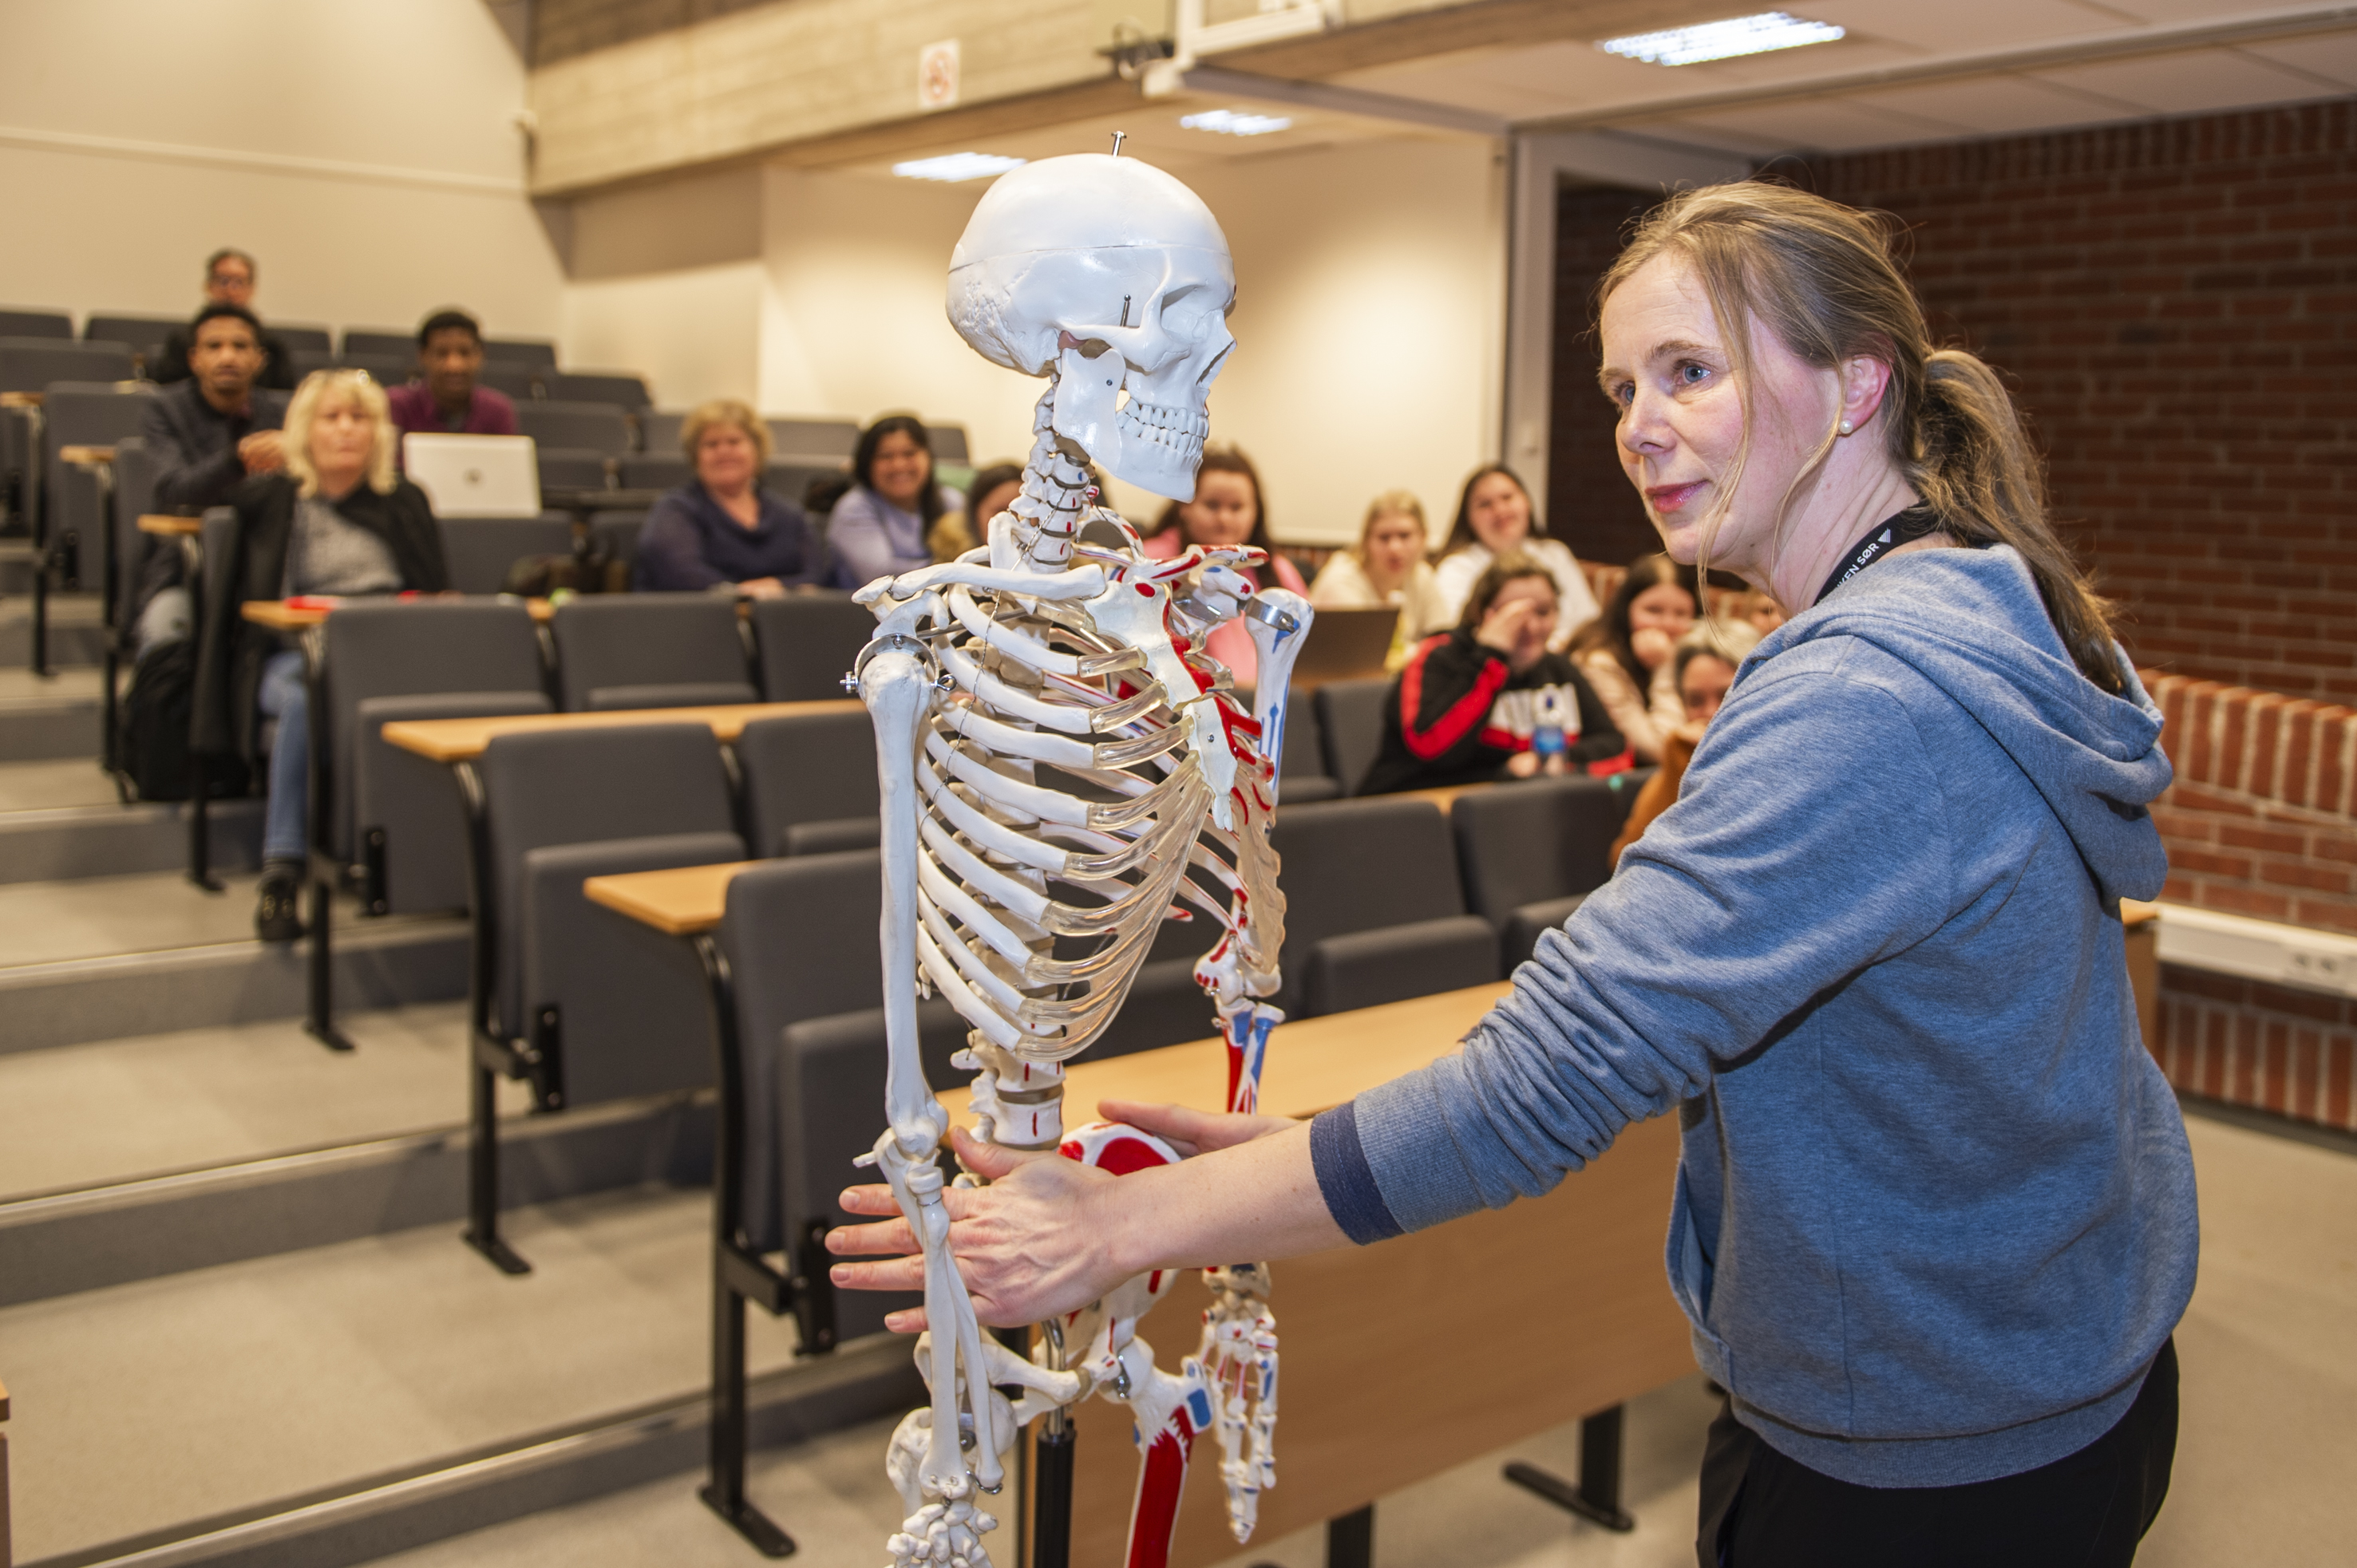 Bilde fra undervisning i helsefag